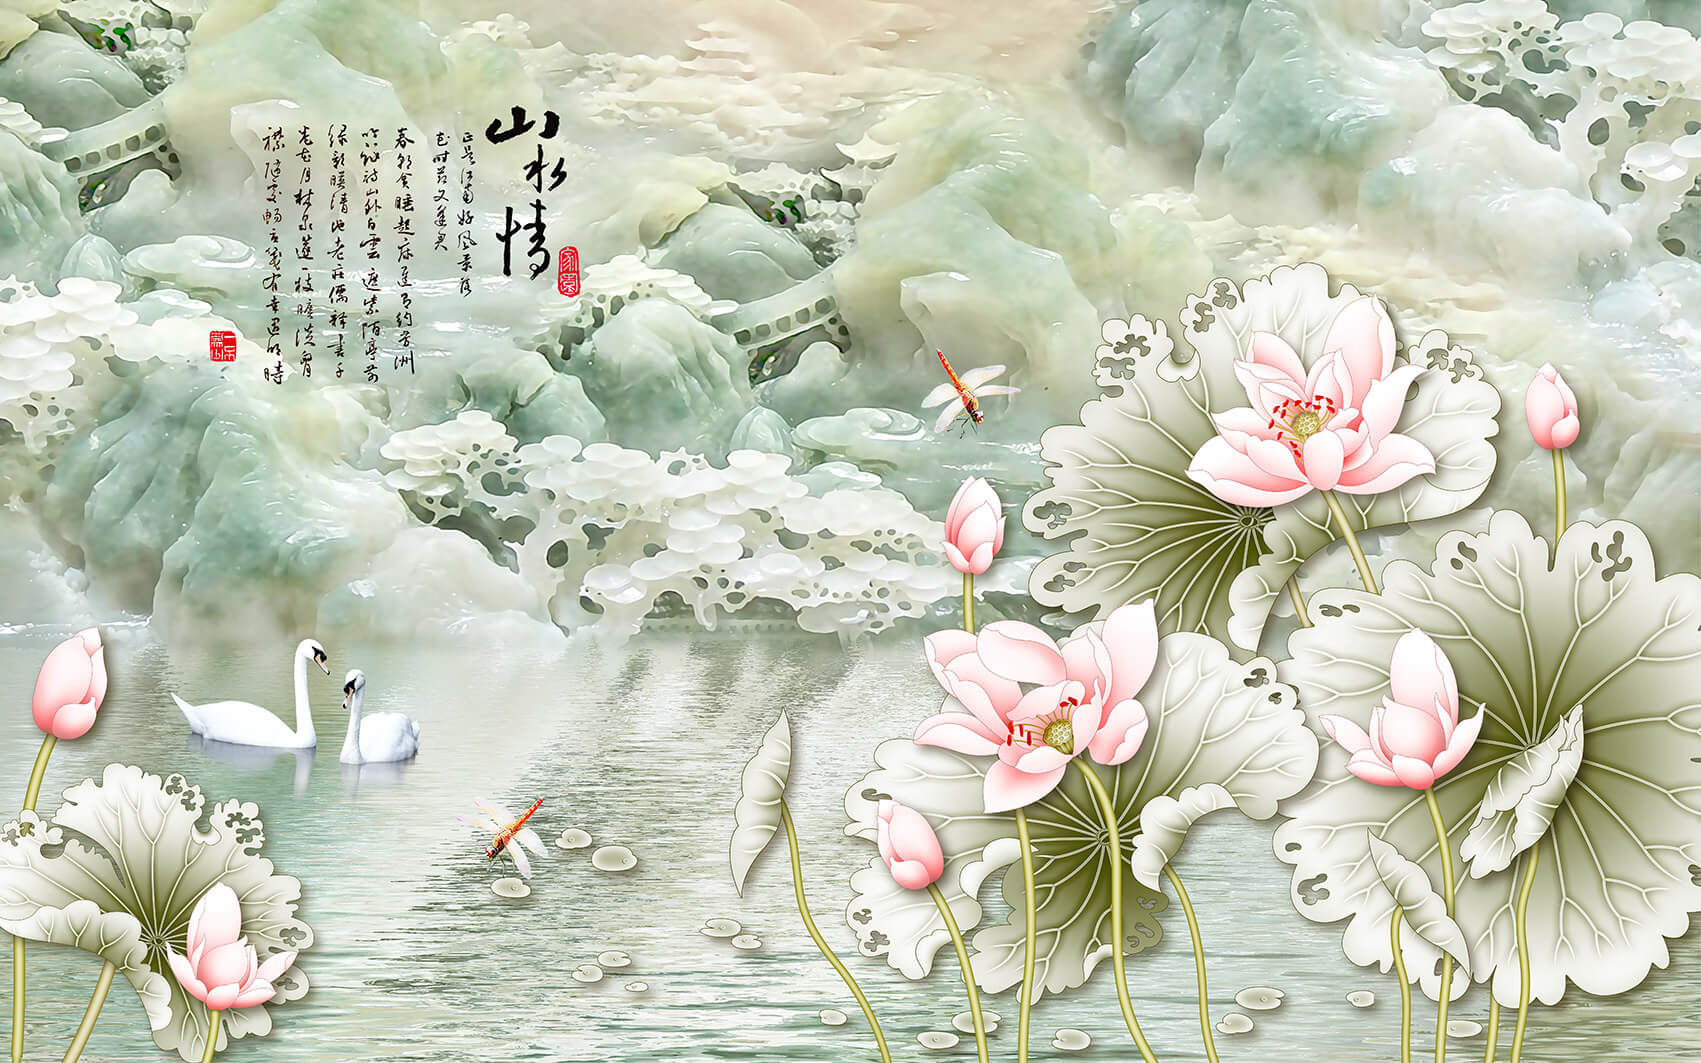 tranh-dan-tuong-gia-ngoc-2945